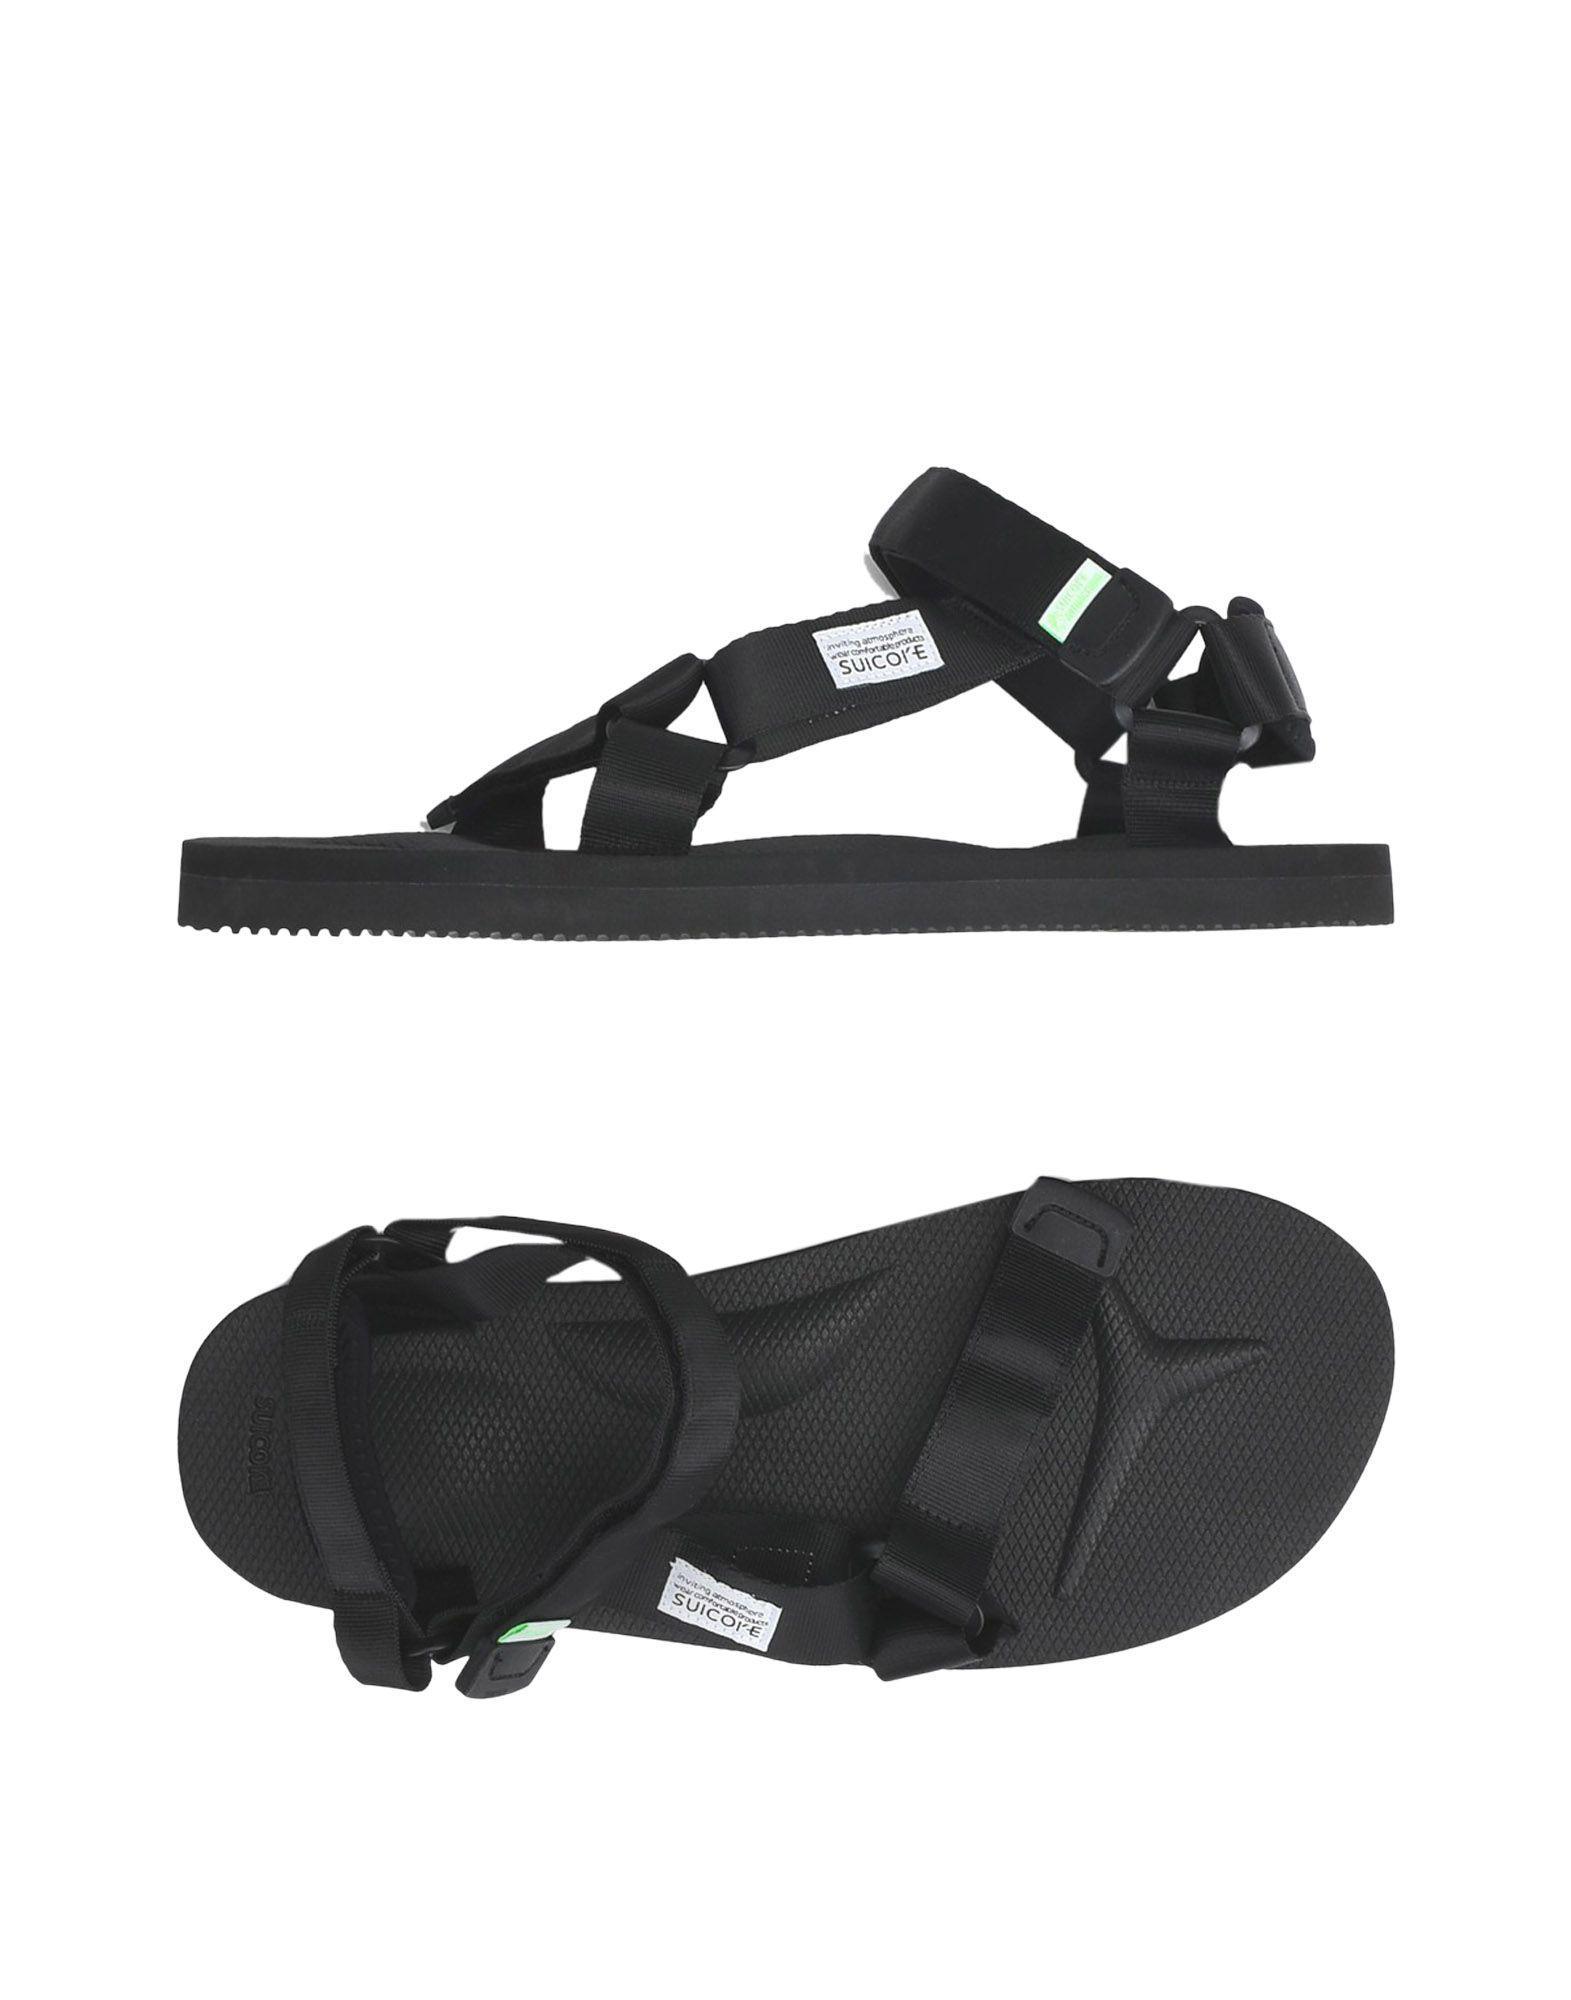 35484401ad7c Suicoke Sandals in Black for Men - Lyst